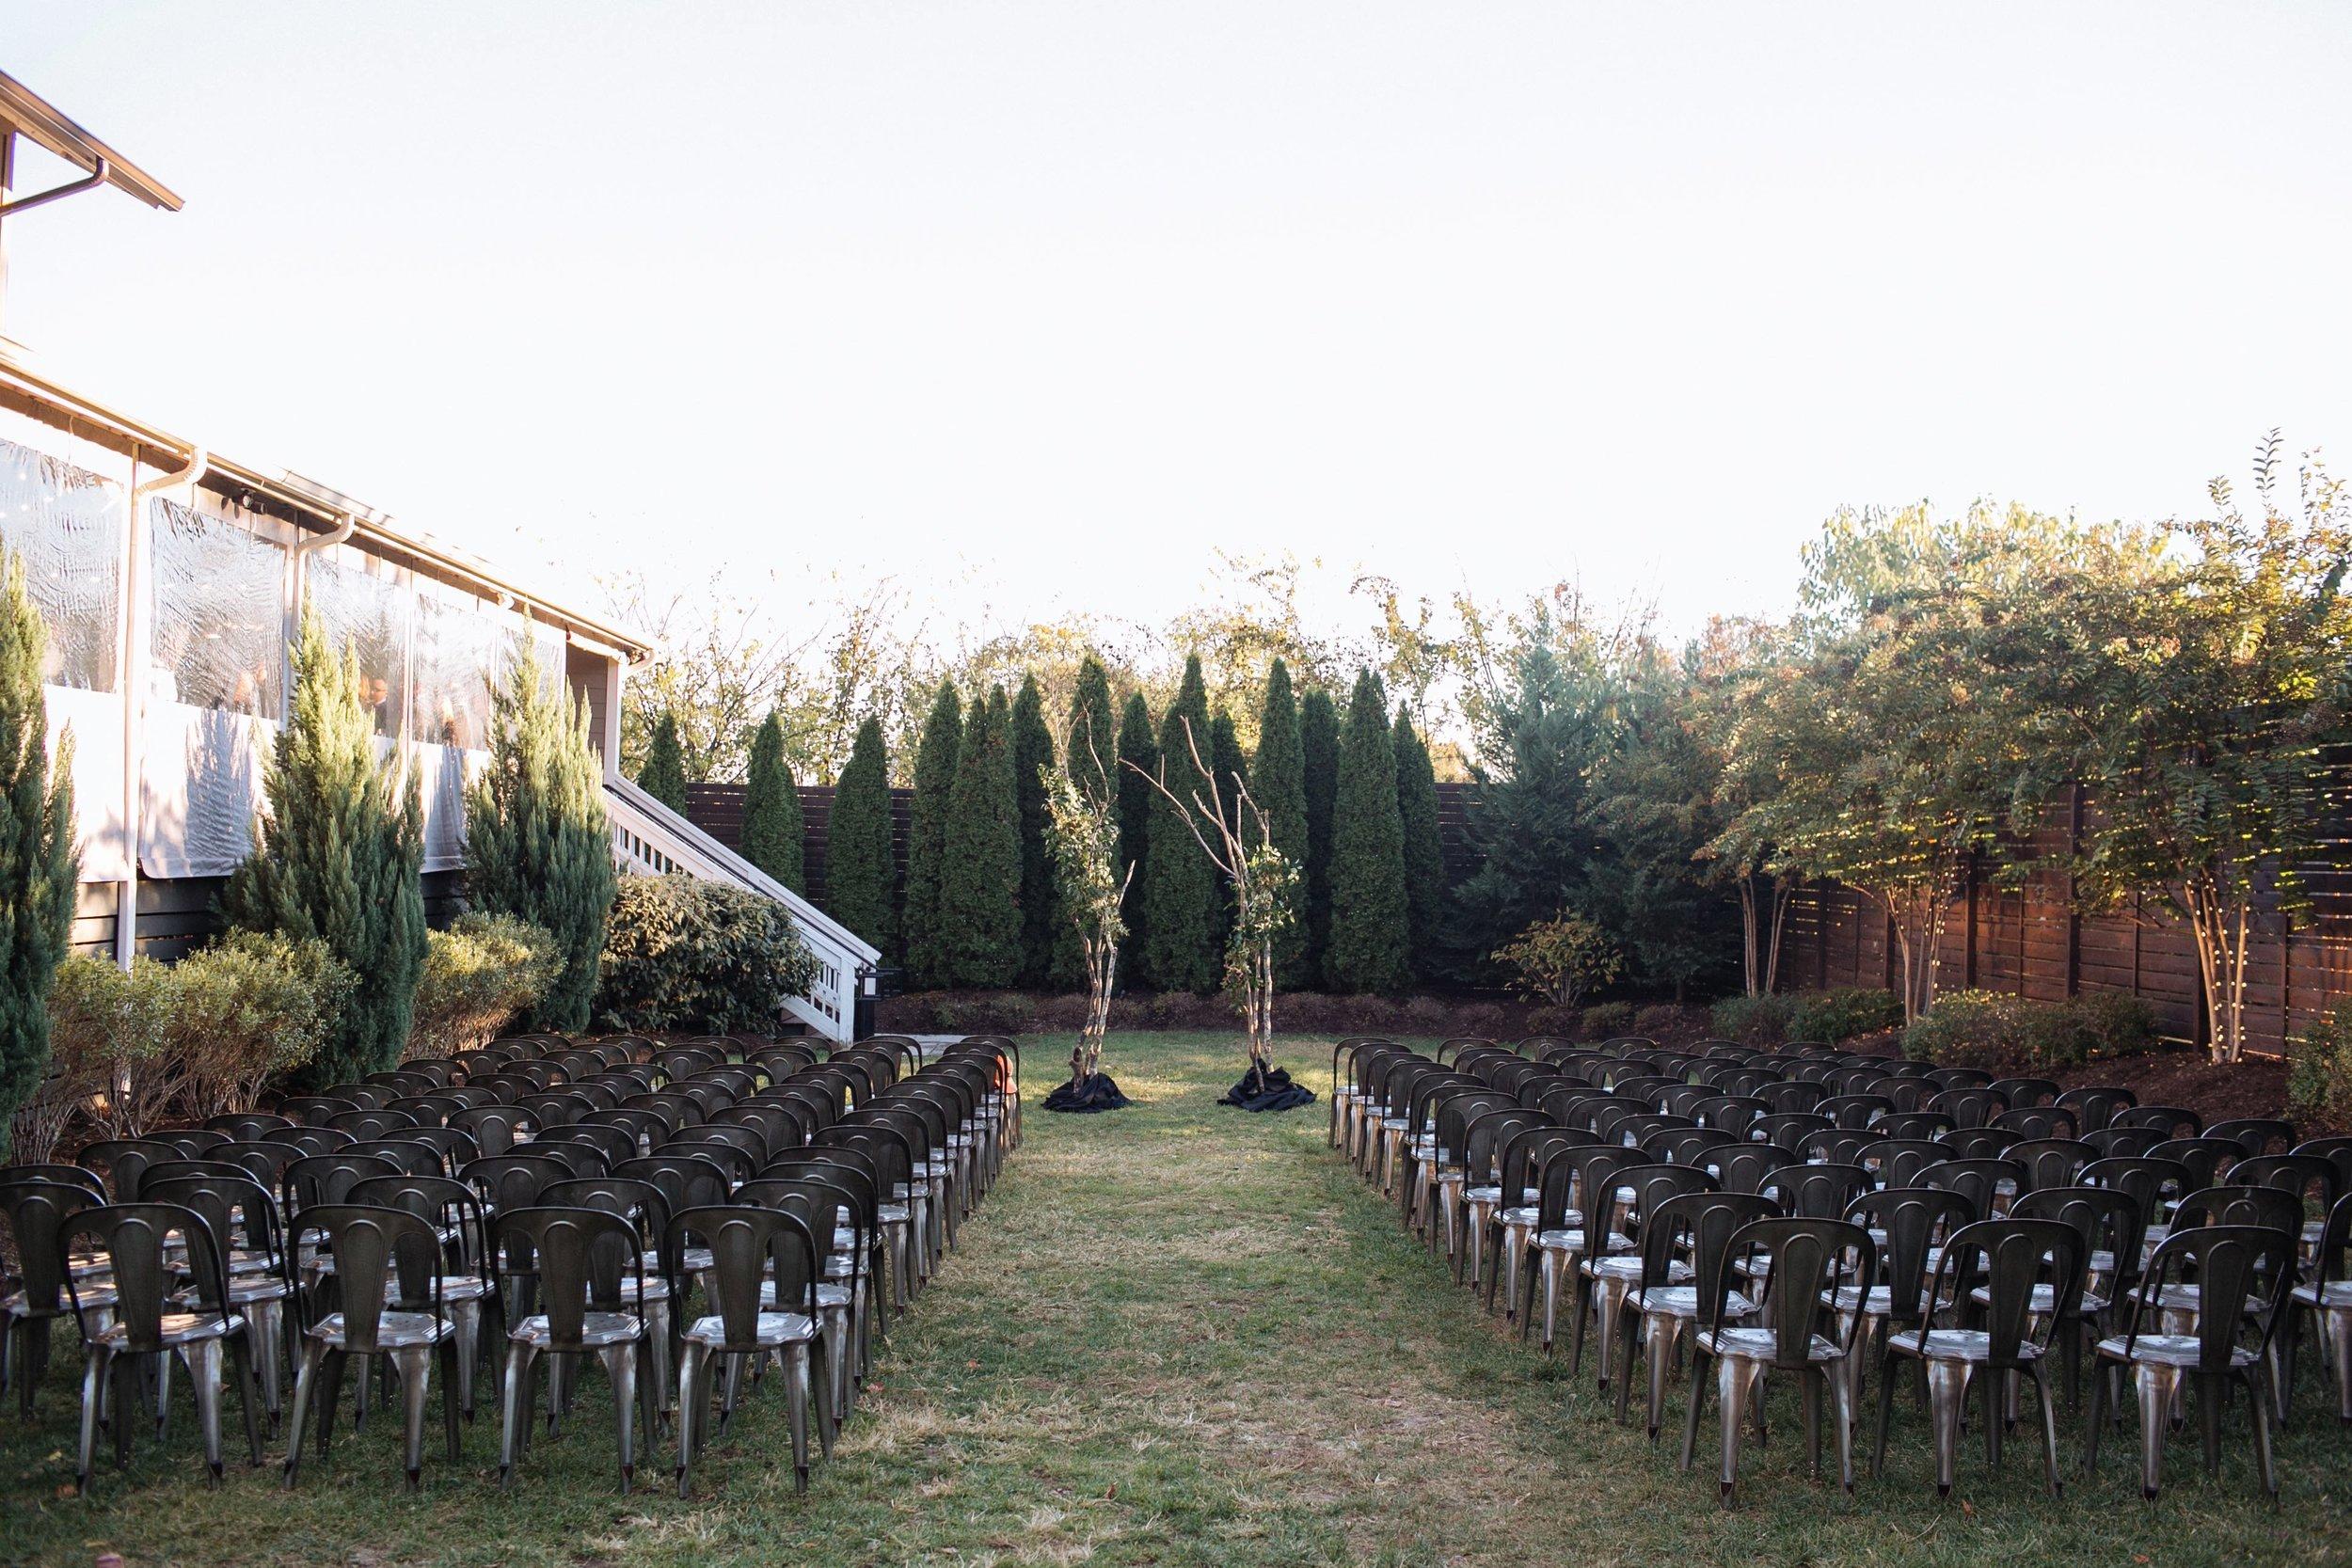 Natural, branchy wedding ceremony backdrop // Rosemary & Finch Floral Design, Nashville TN